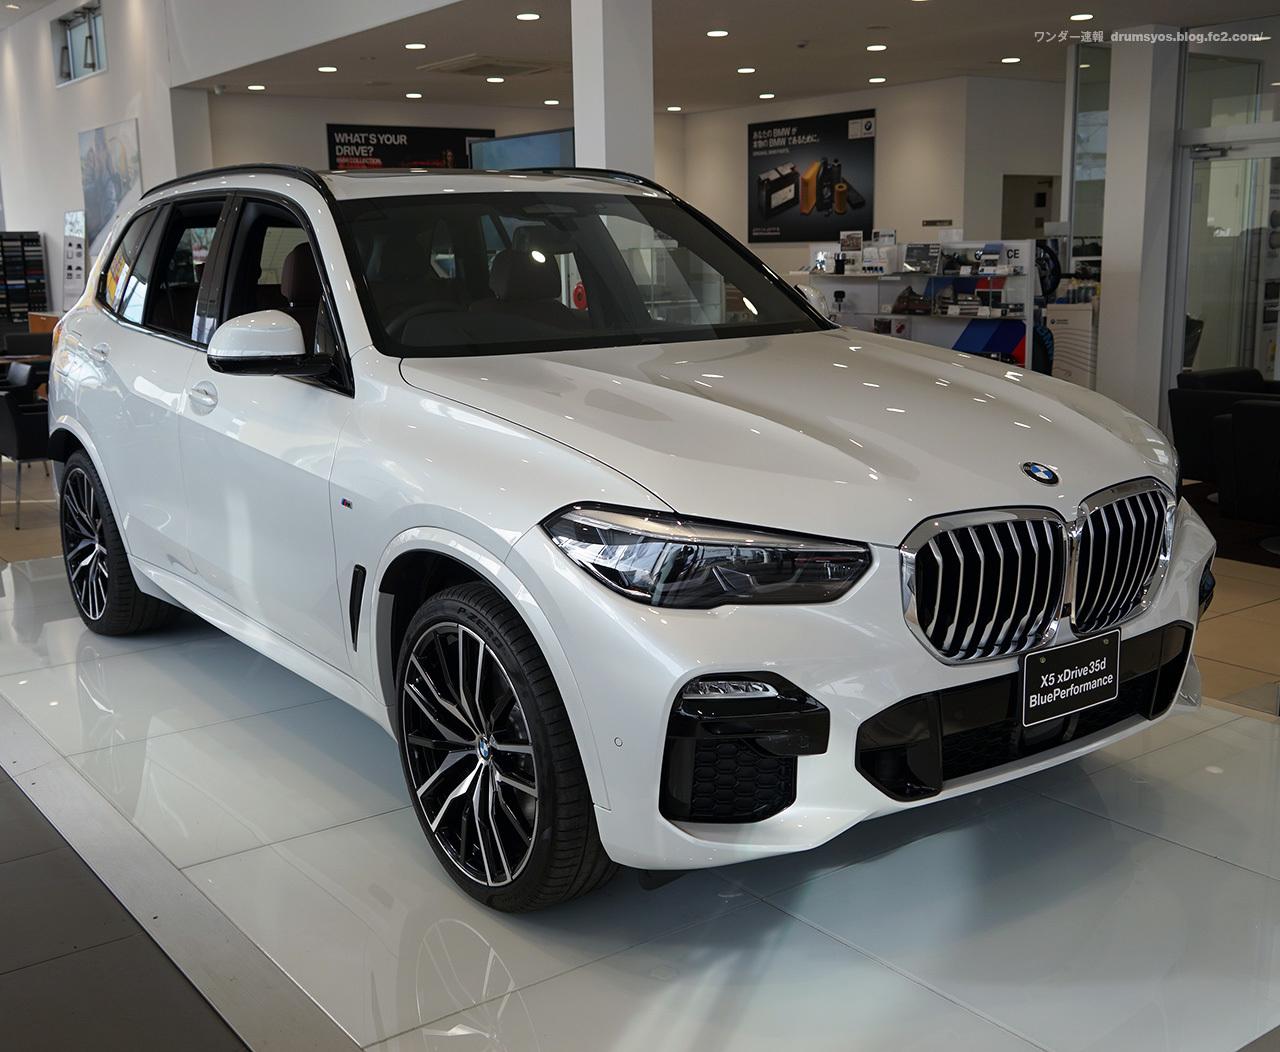 BMWX5_03_201904261841461c9.jpg